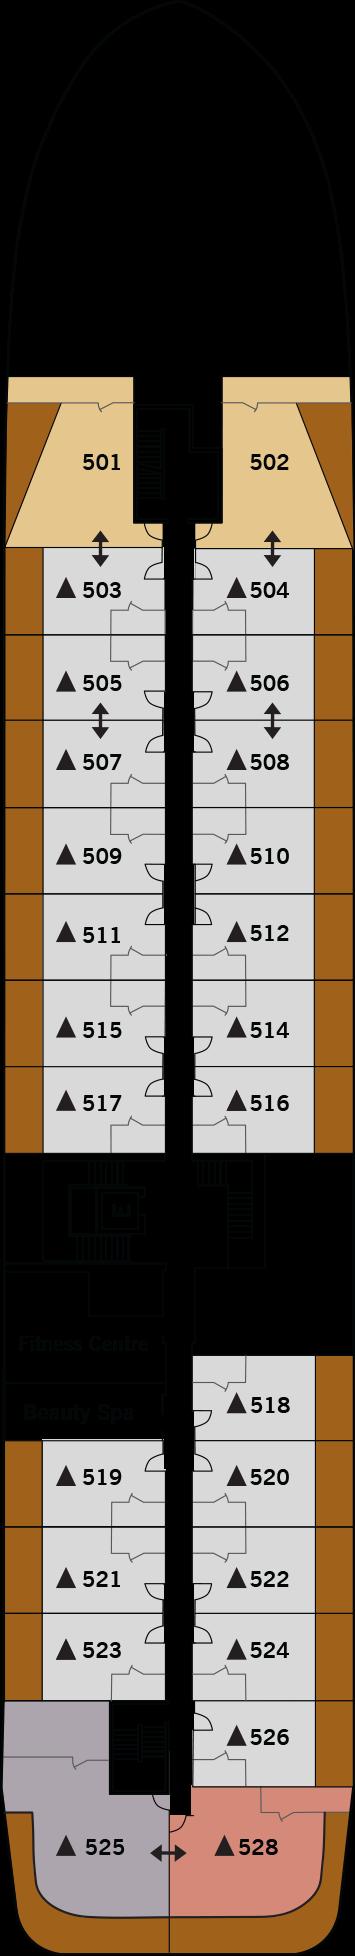 Silver Origin Deck 5: Deck 5